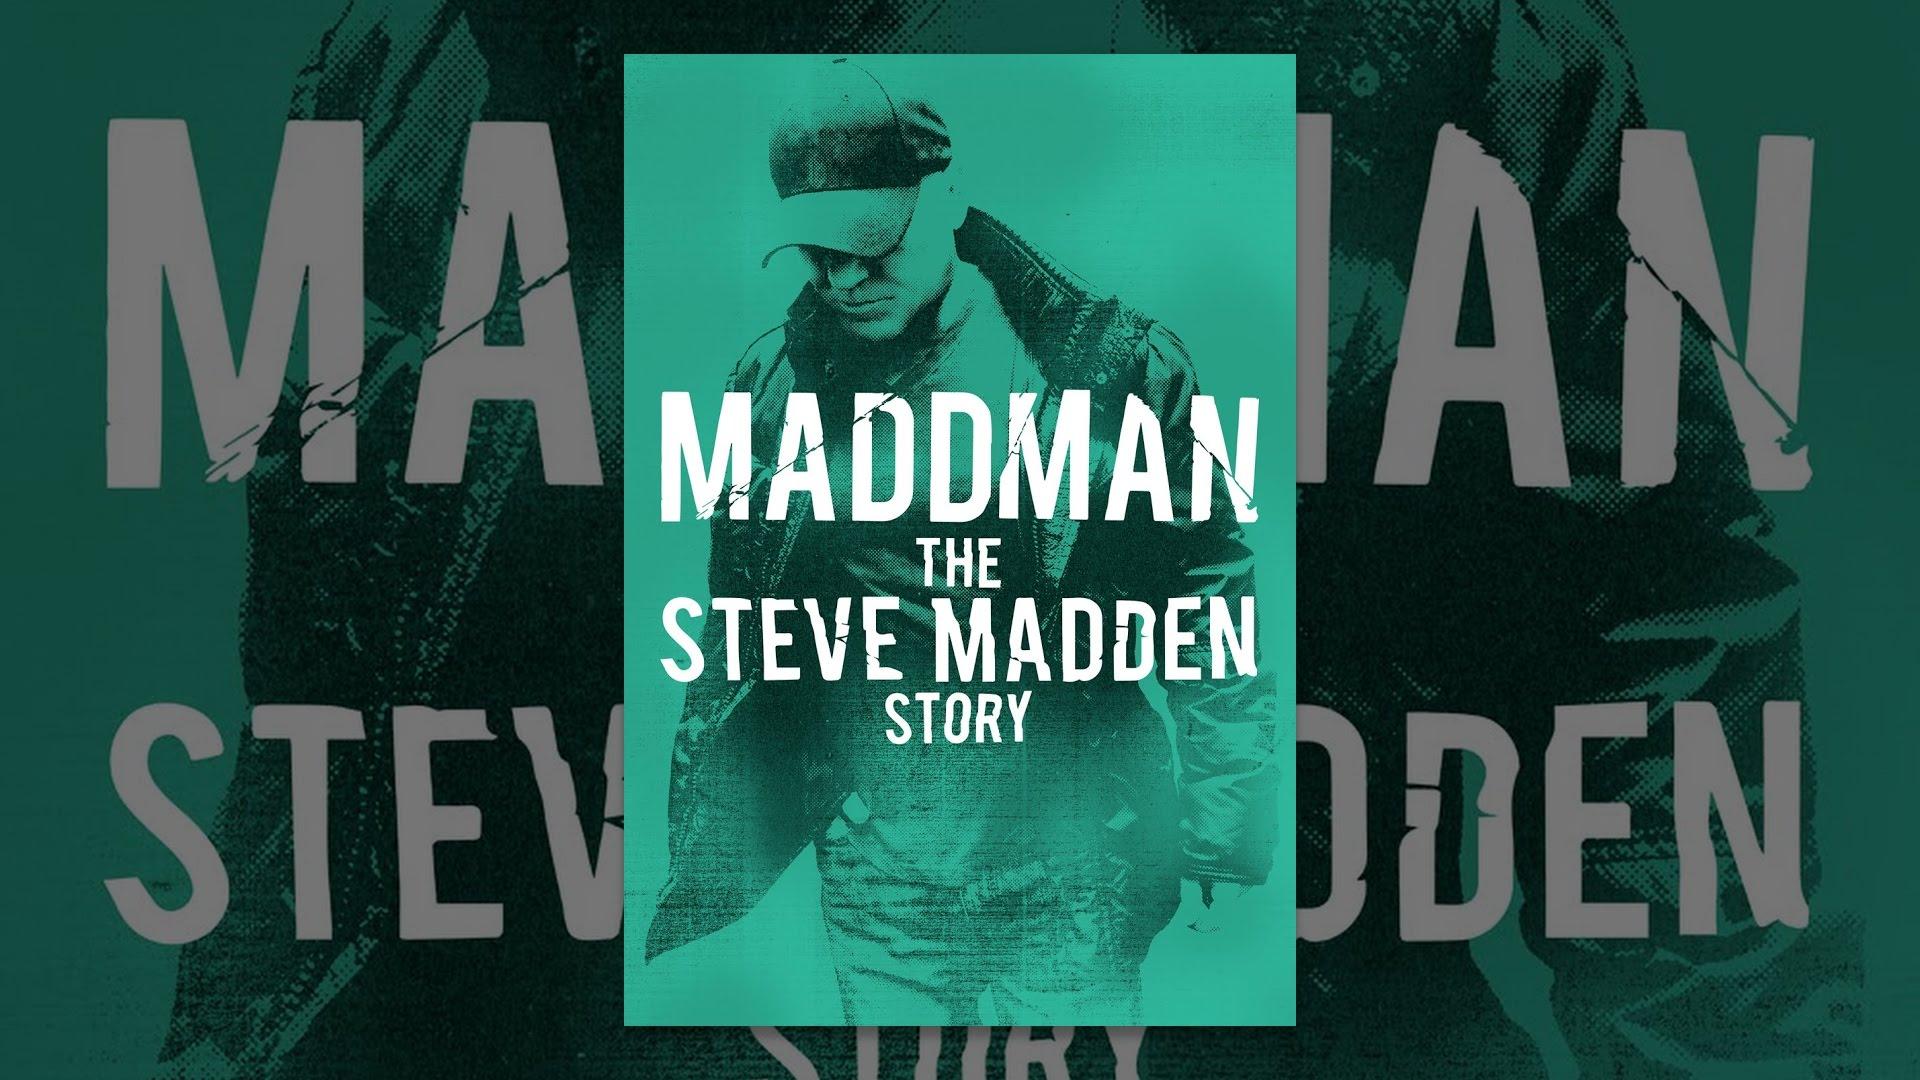 [VIDEO] - Maddman: The Steve Madden Story 2